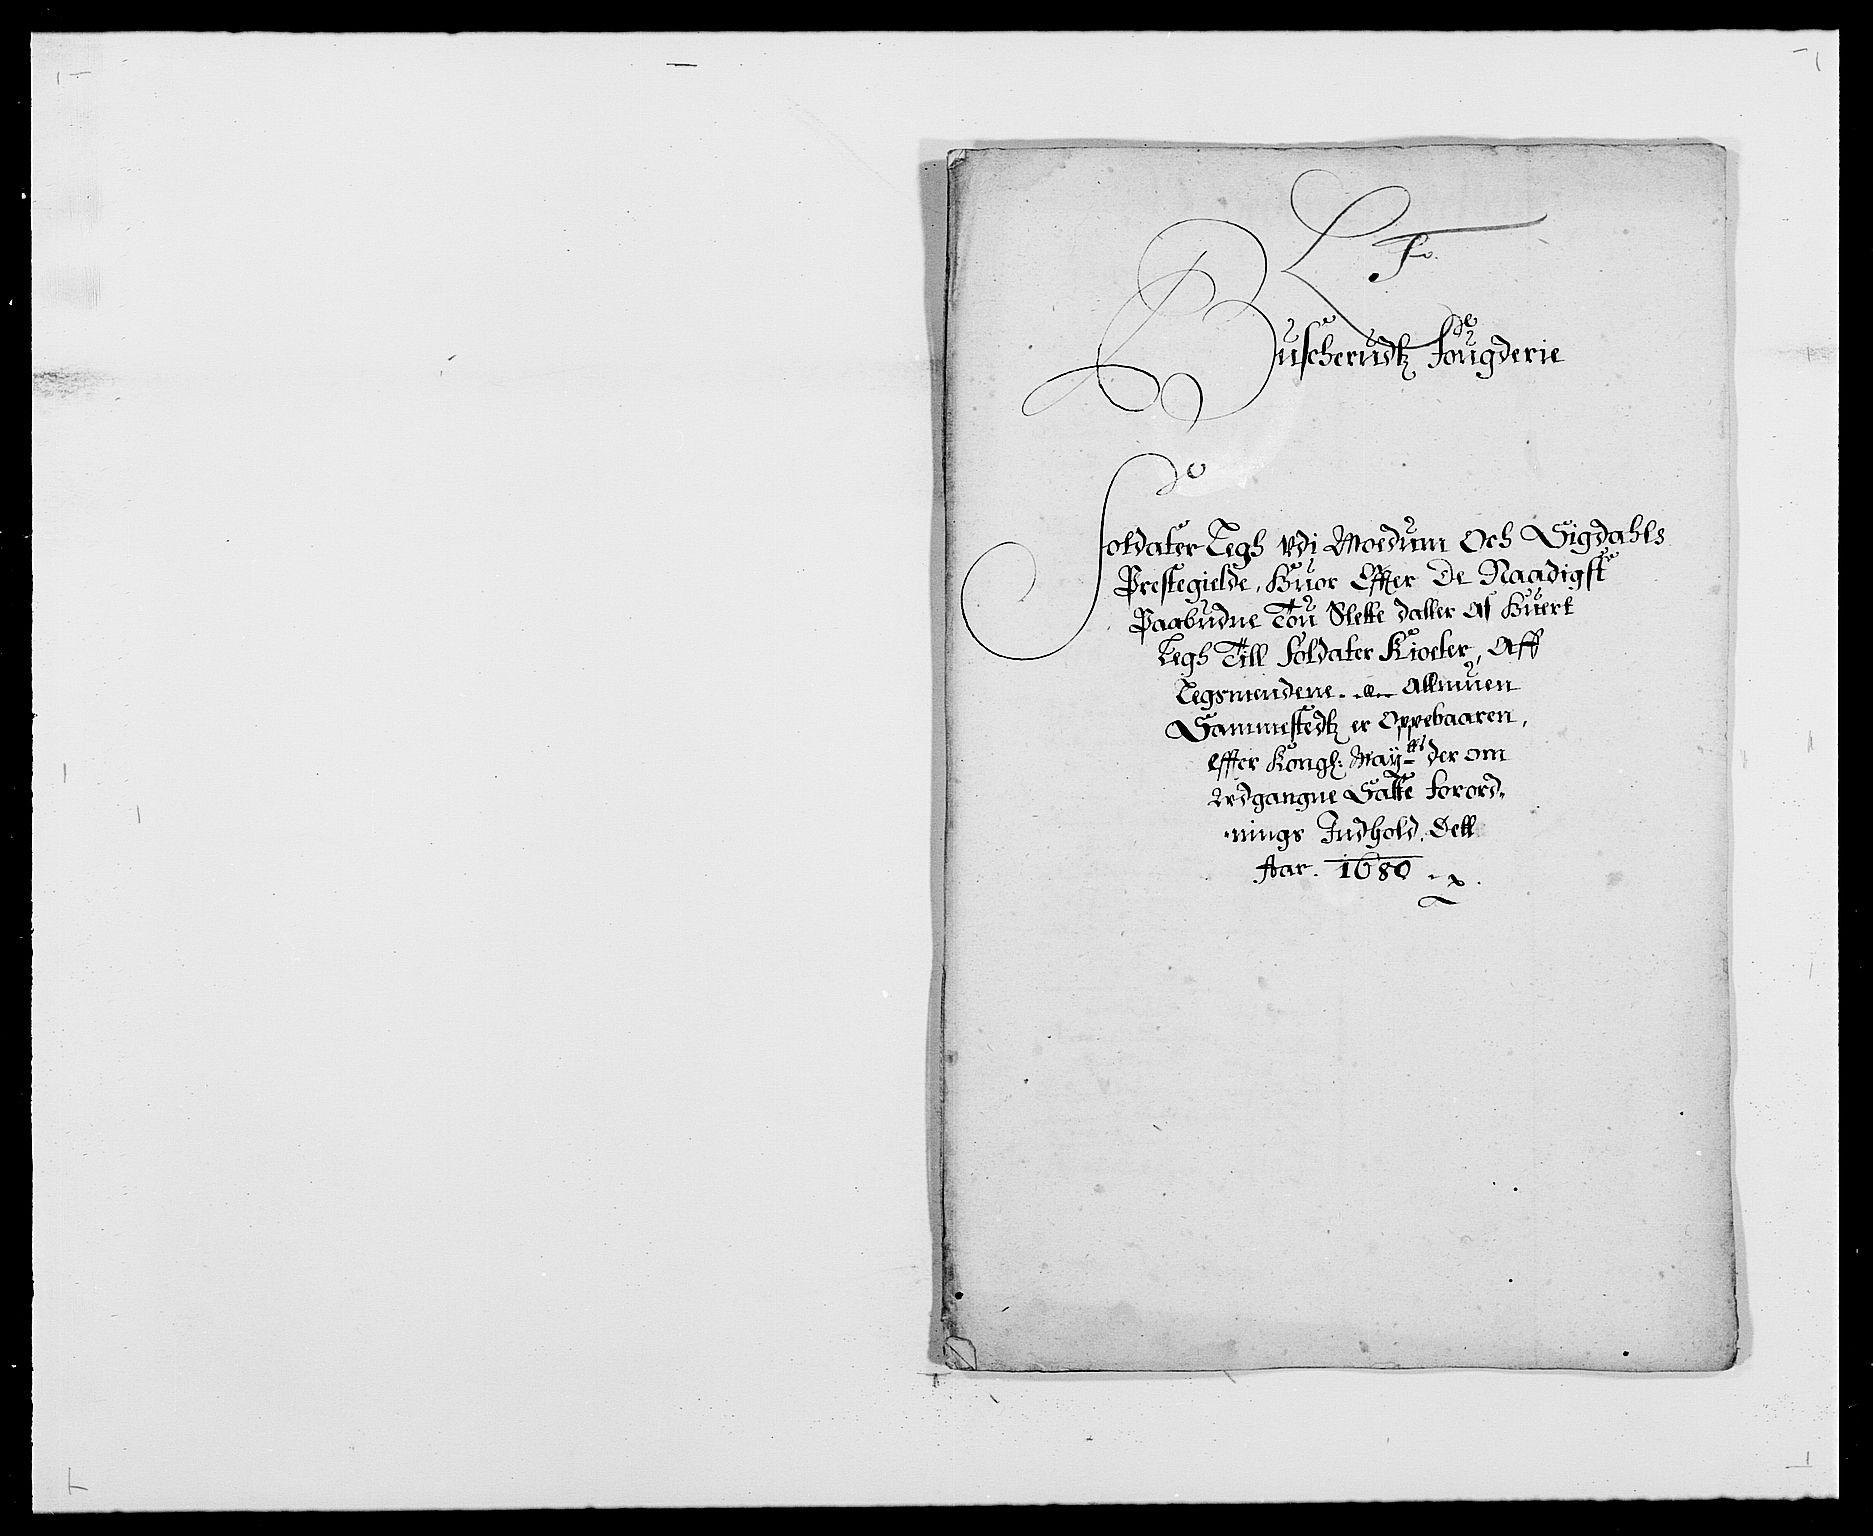 RA, Rentekammeret inntil 1814, Reviderte regnskaper, Fogderegnskap, R25/L1675: Fogderegnskap Buskerud, 1678-1681, s. 136